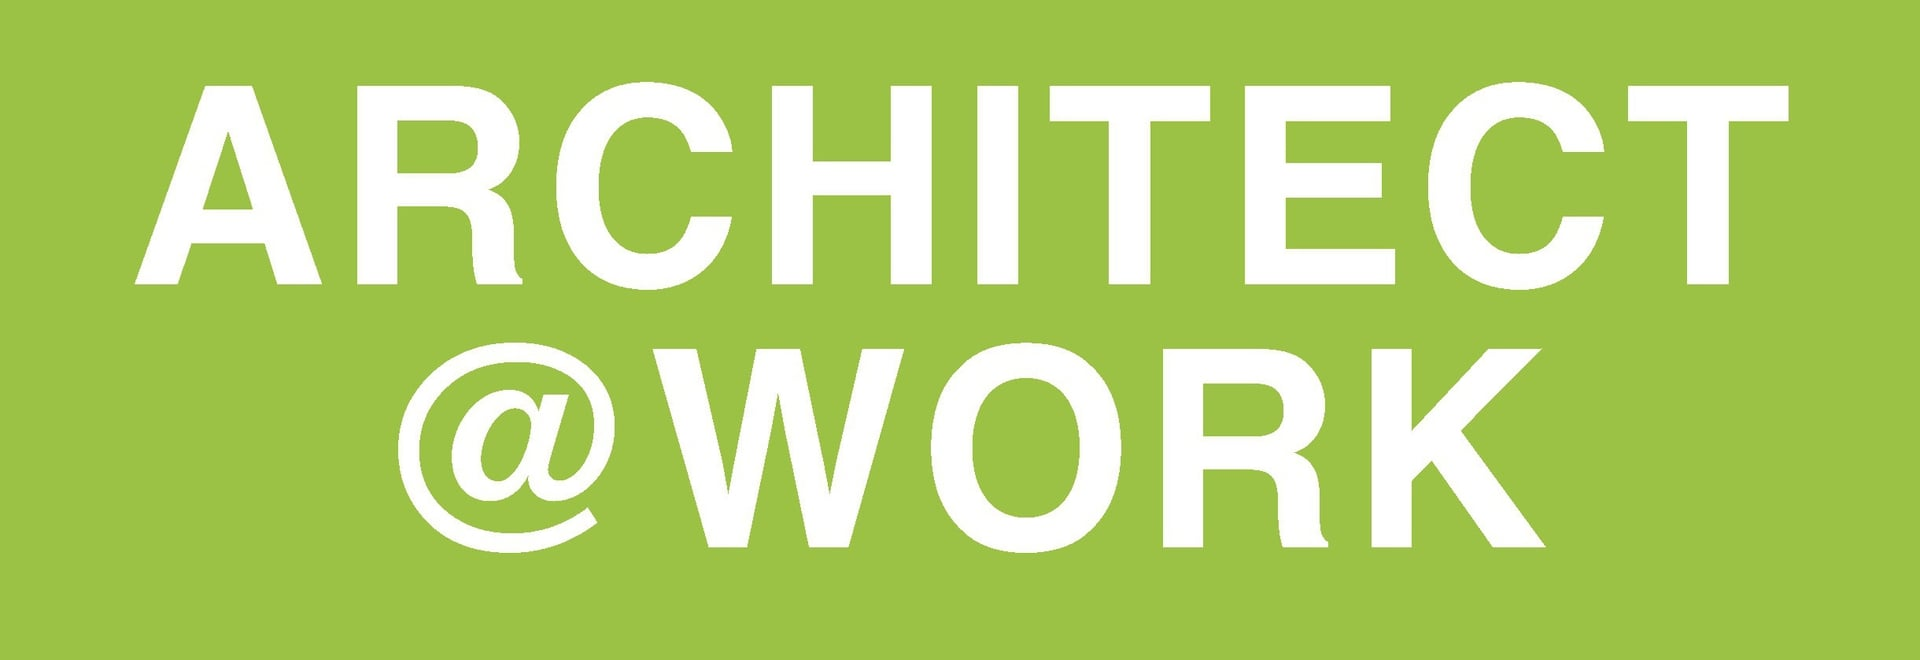 ARchitect @ Work - France